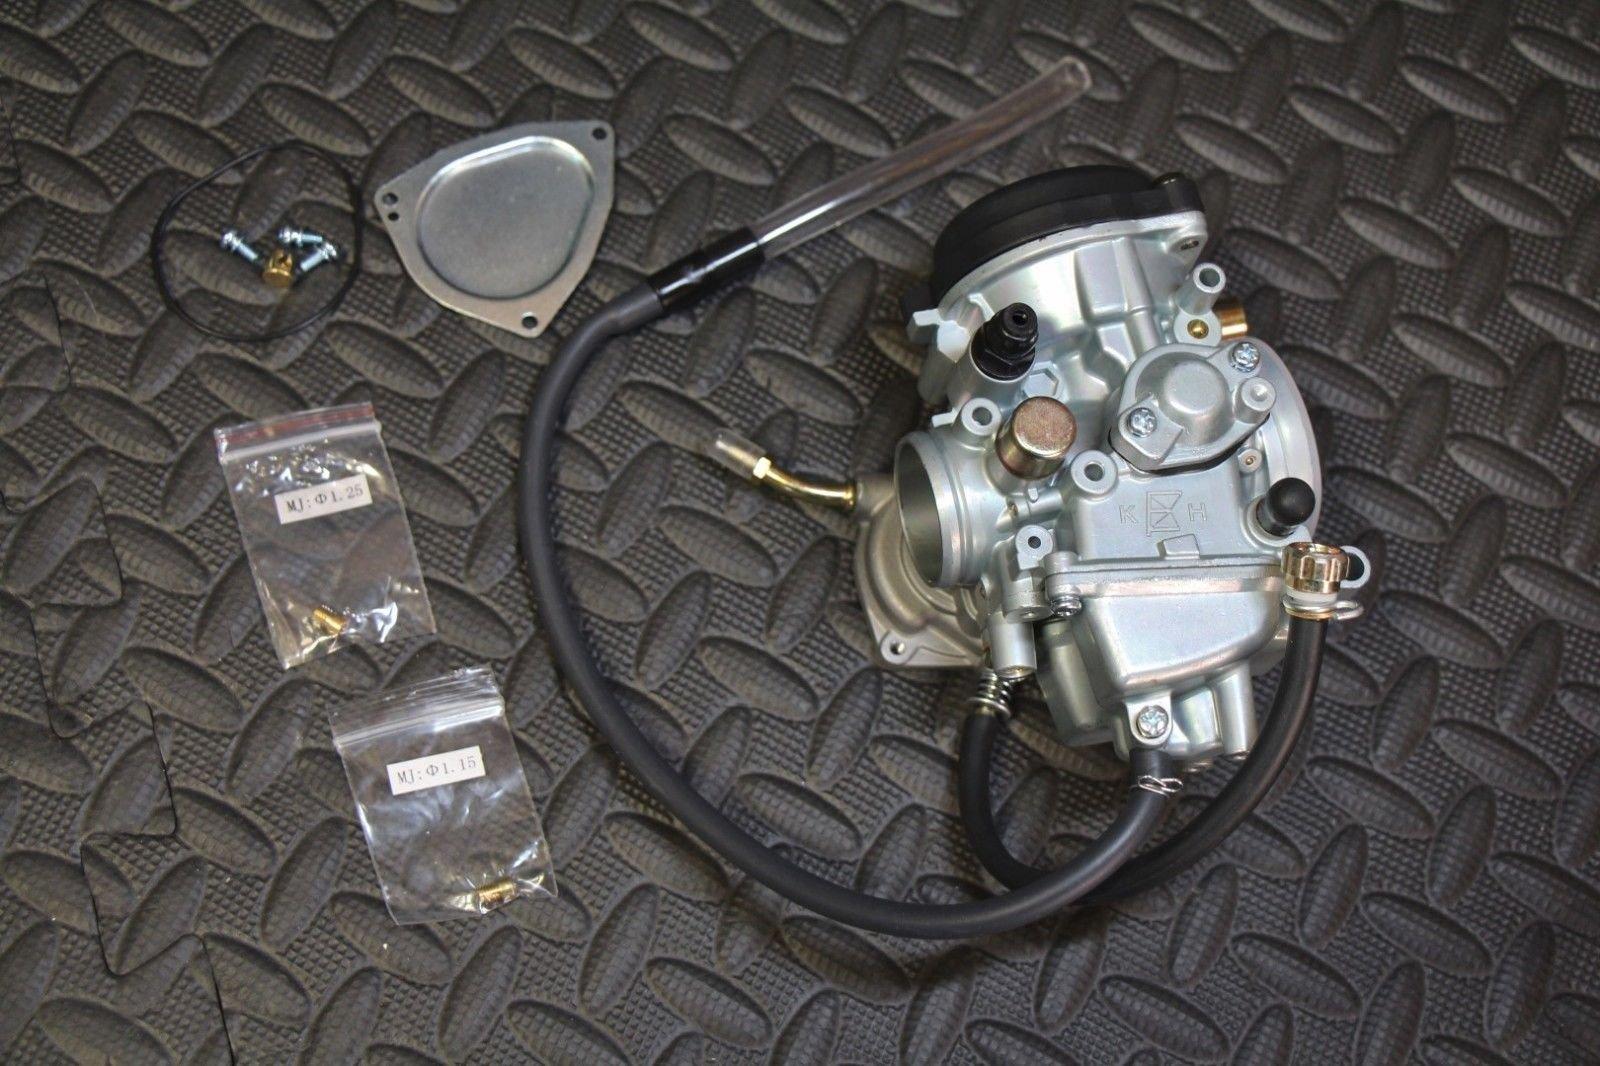 NEW Yamaha Big Bear 400 Kodiak Wolverine carburetor carb ATV ships from Michigan by vitos performance (Image #1)